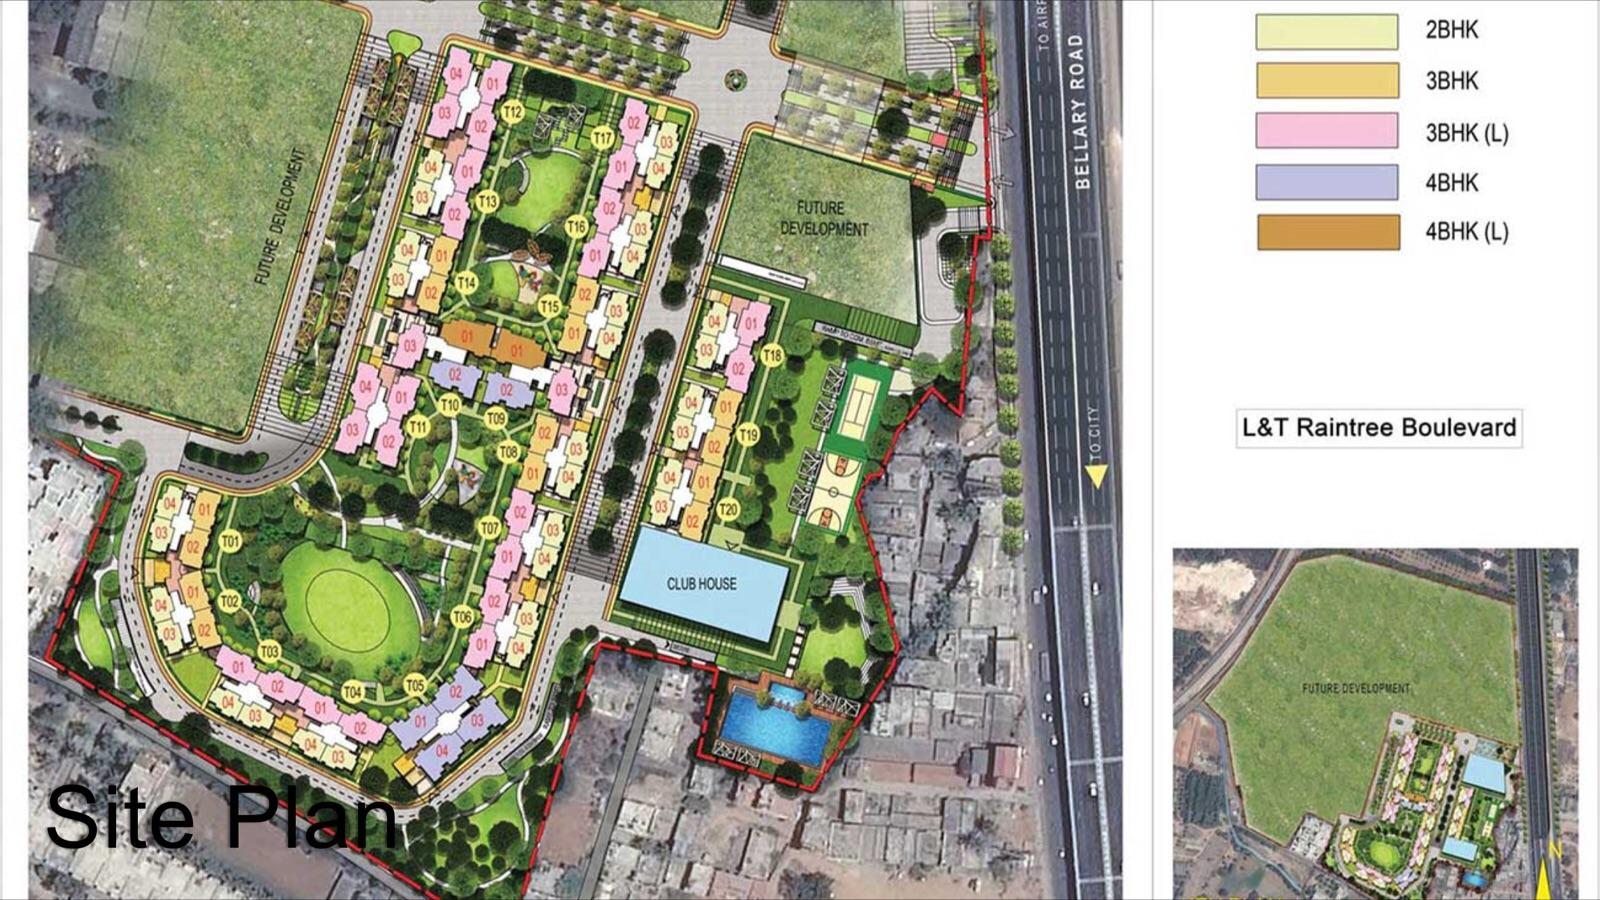 l t raintree boulevard master plan image1